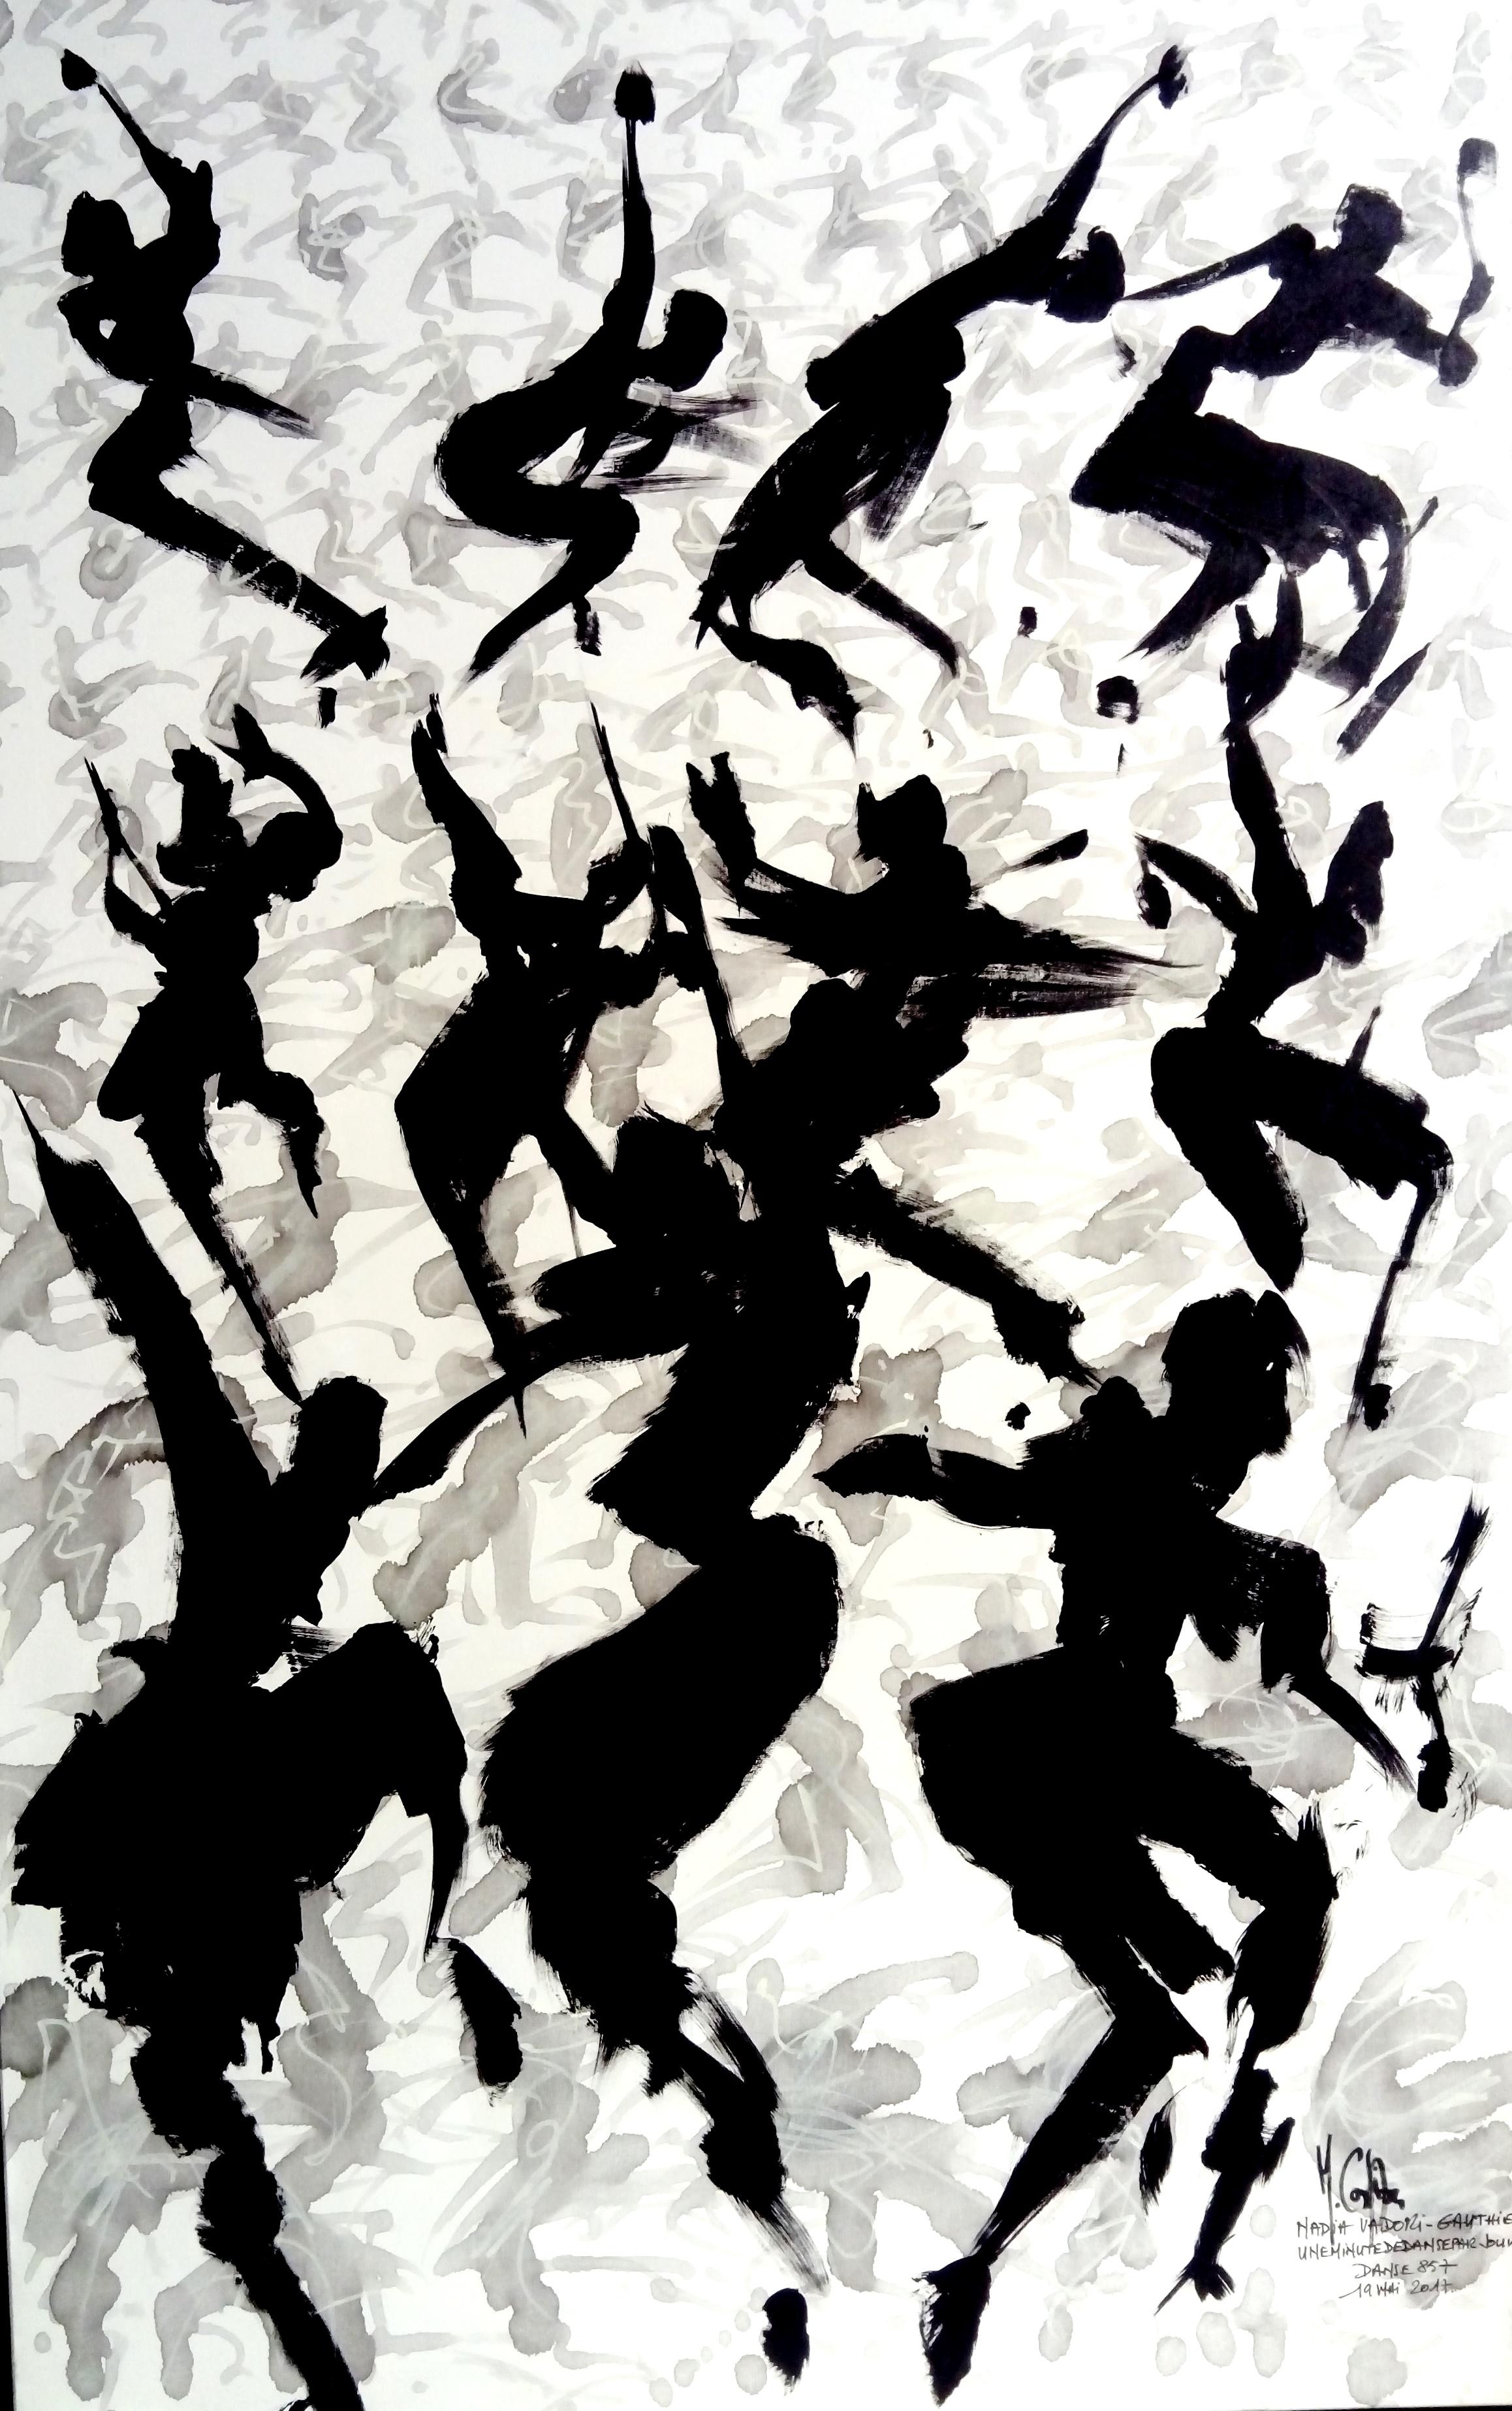 Exposition : « Signes de vie », peintures de Michel Costiou